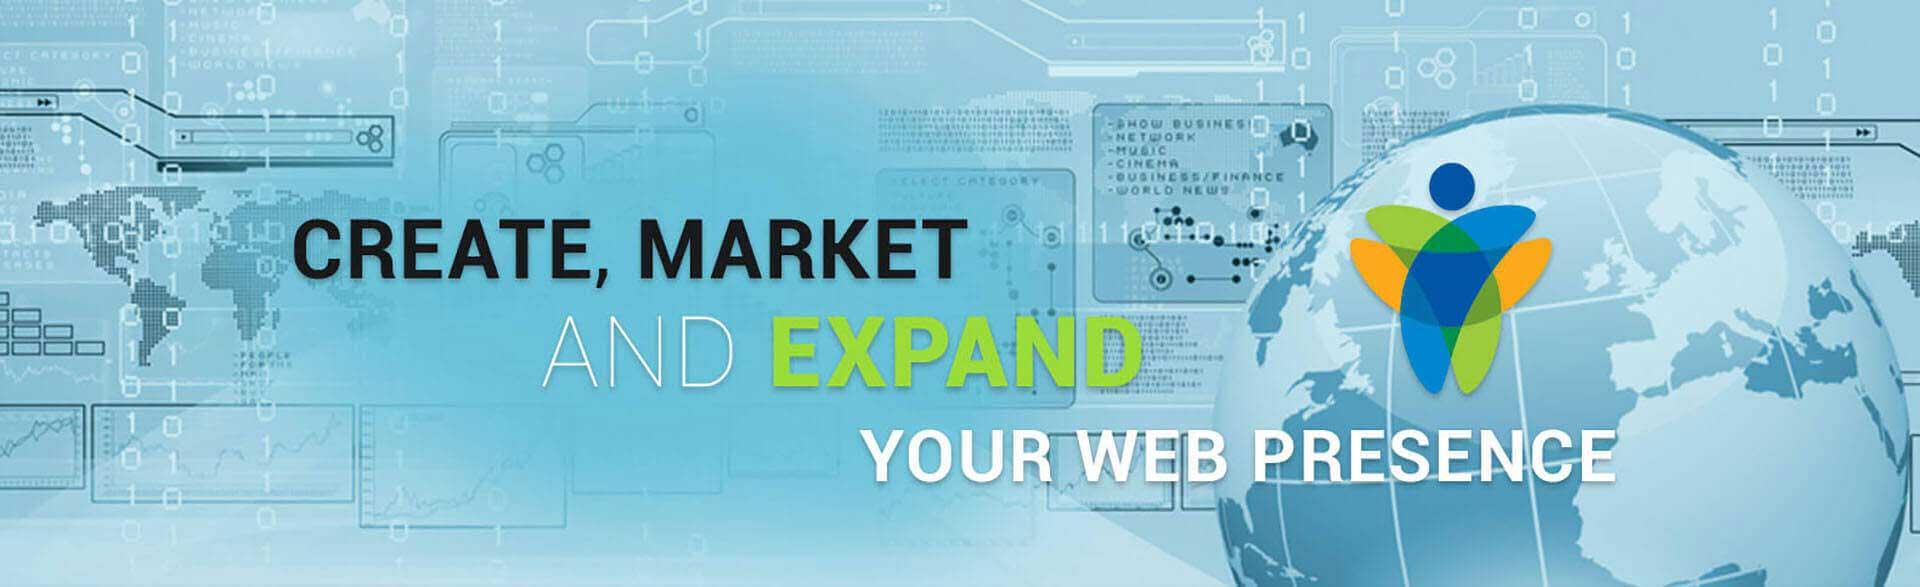 Create Market